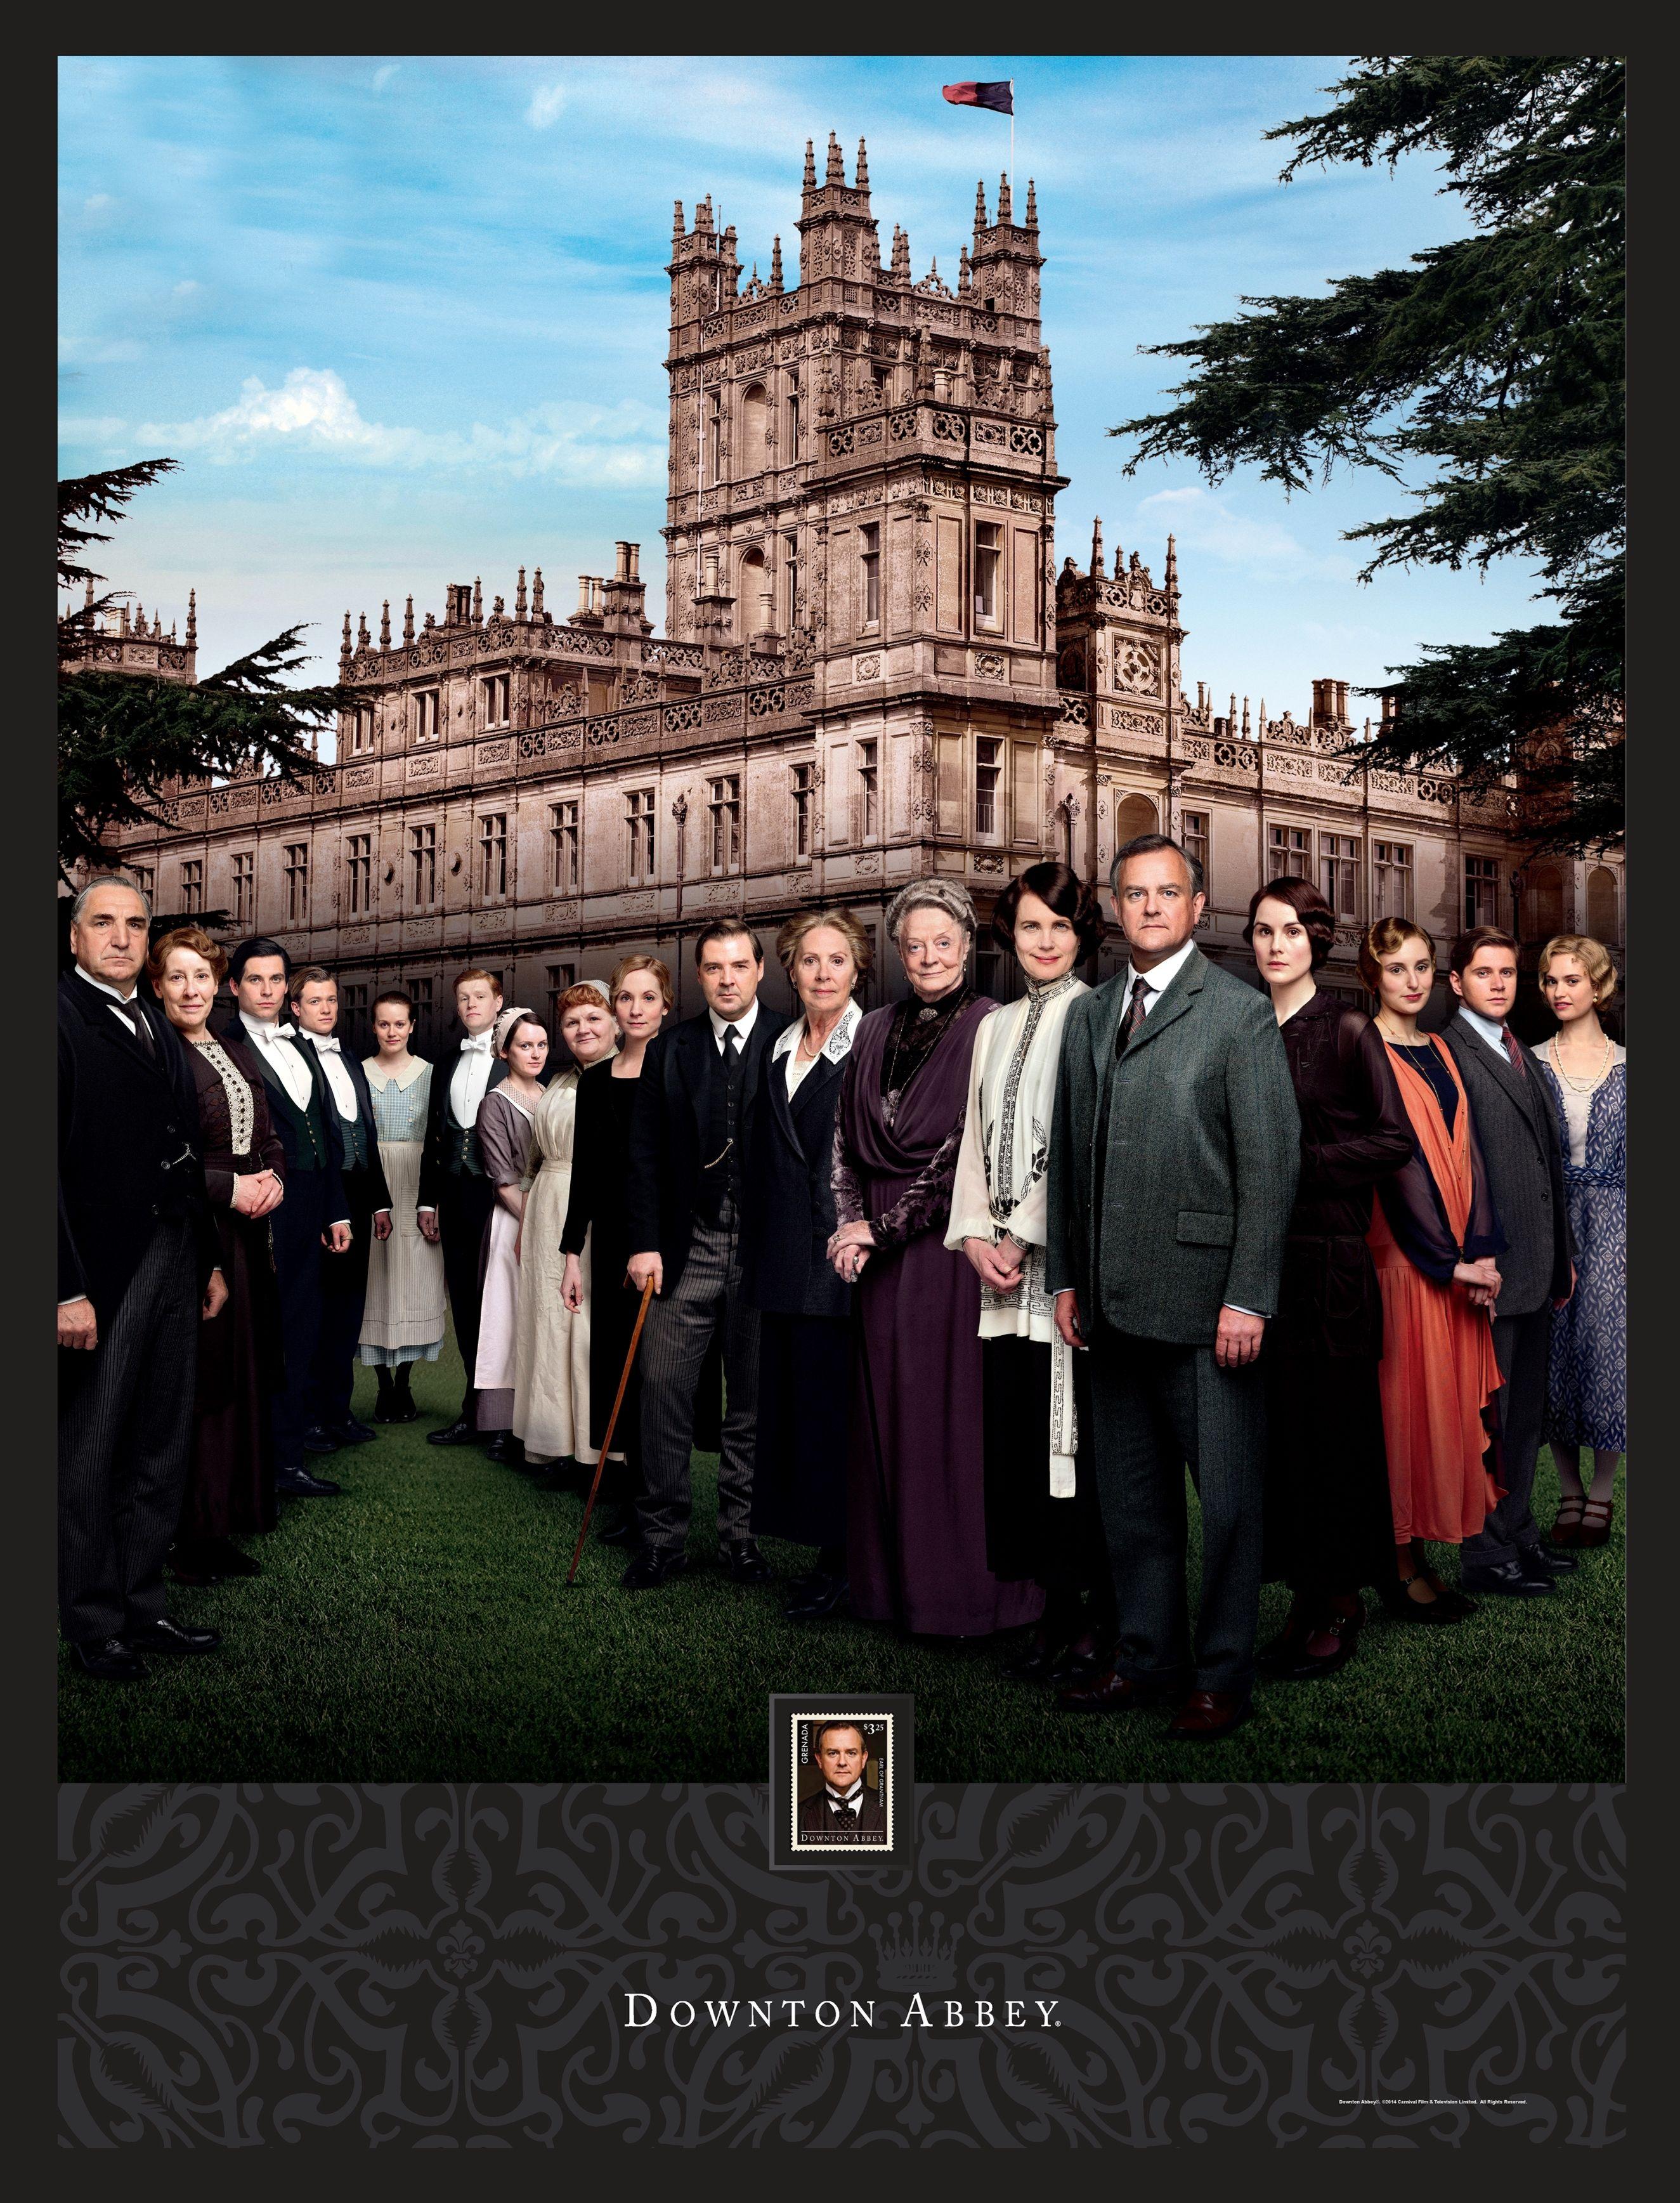 Downton Abbey Season 4 #DowntonAbbey #DTA #Season4 #wallart ...